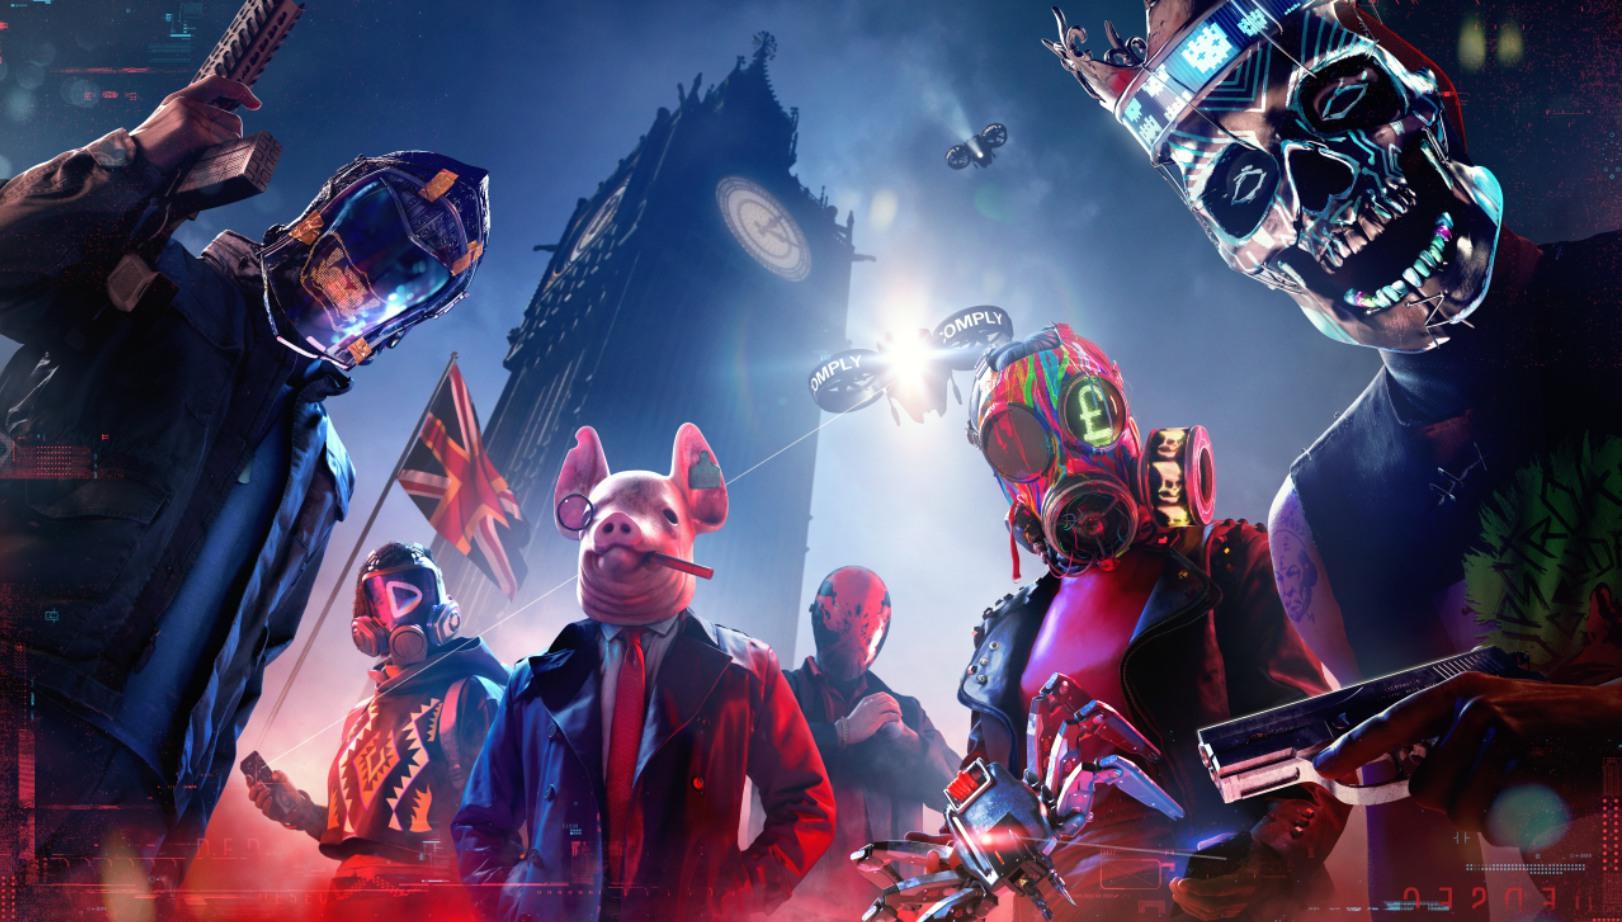 【E3】駭客救世界  《看門狗》系列新作明年3月推出